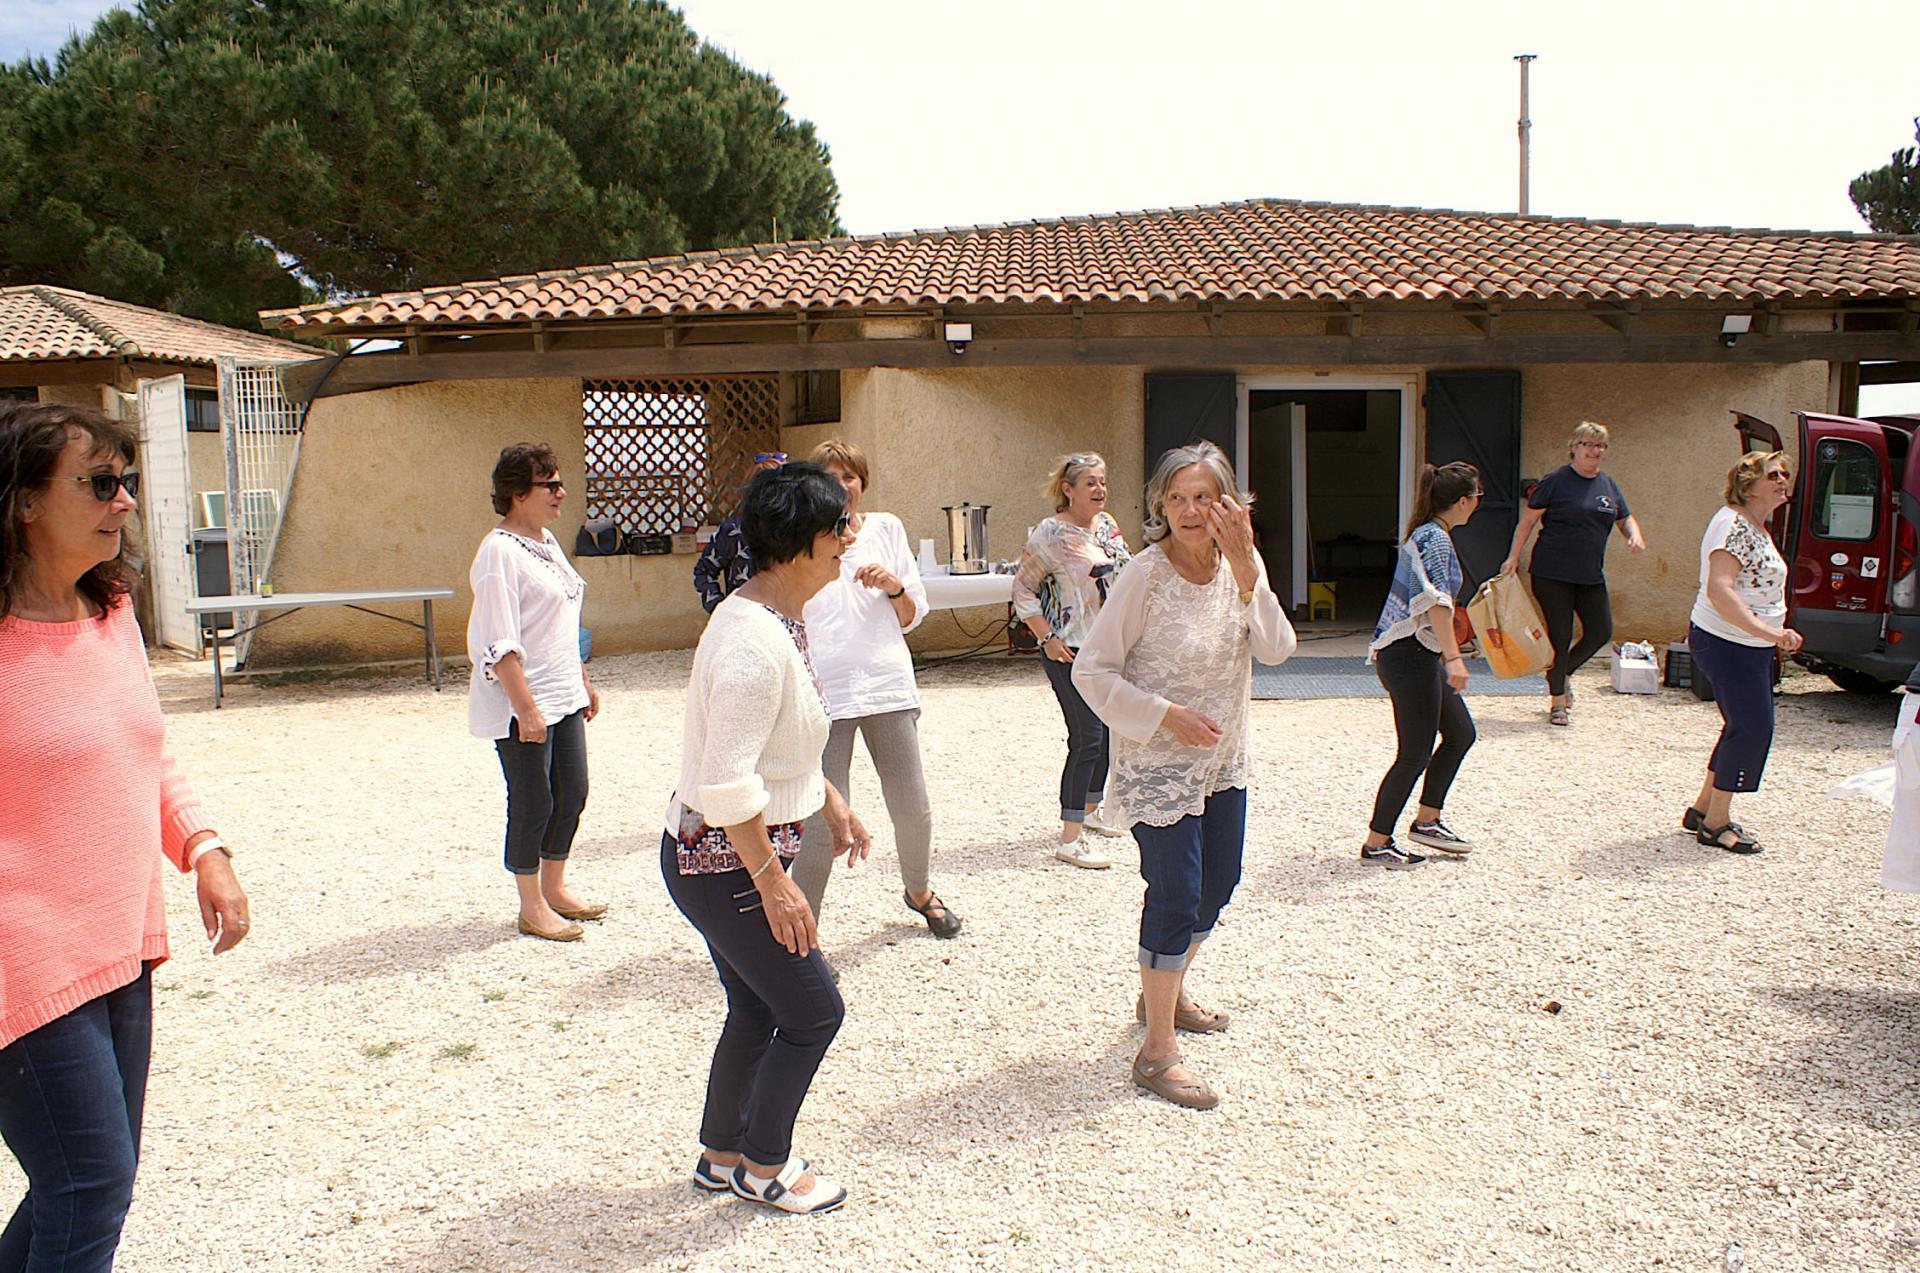 Les femmes dansent 2